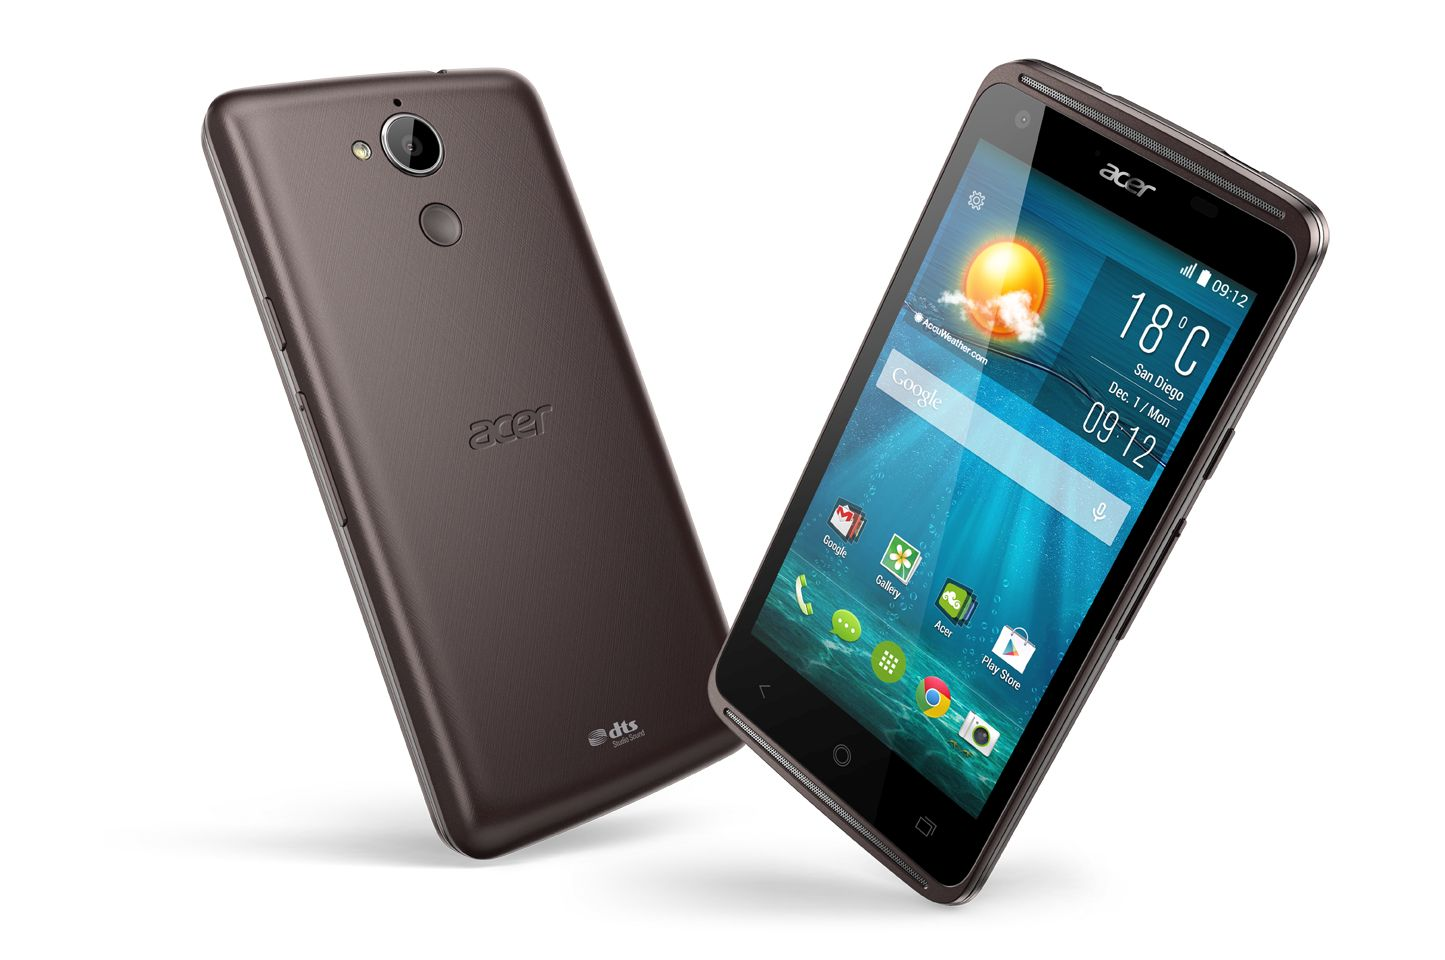 Smartfon_Acer_Liquid_Z410